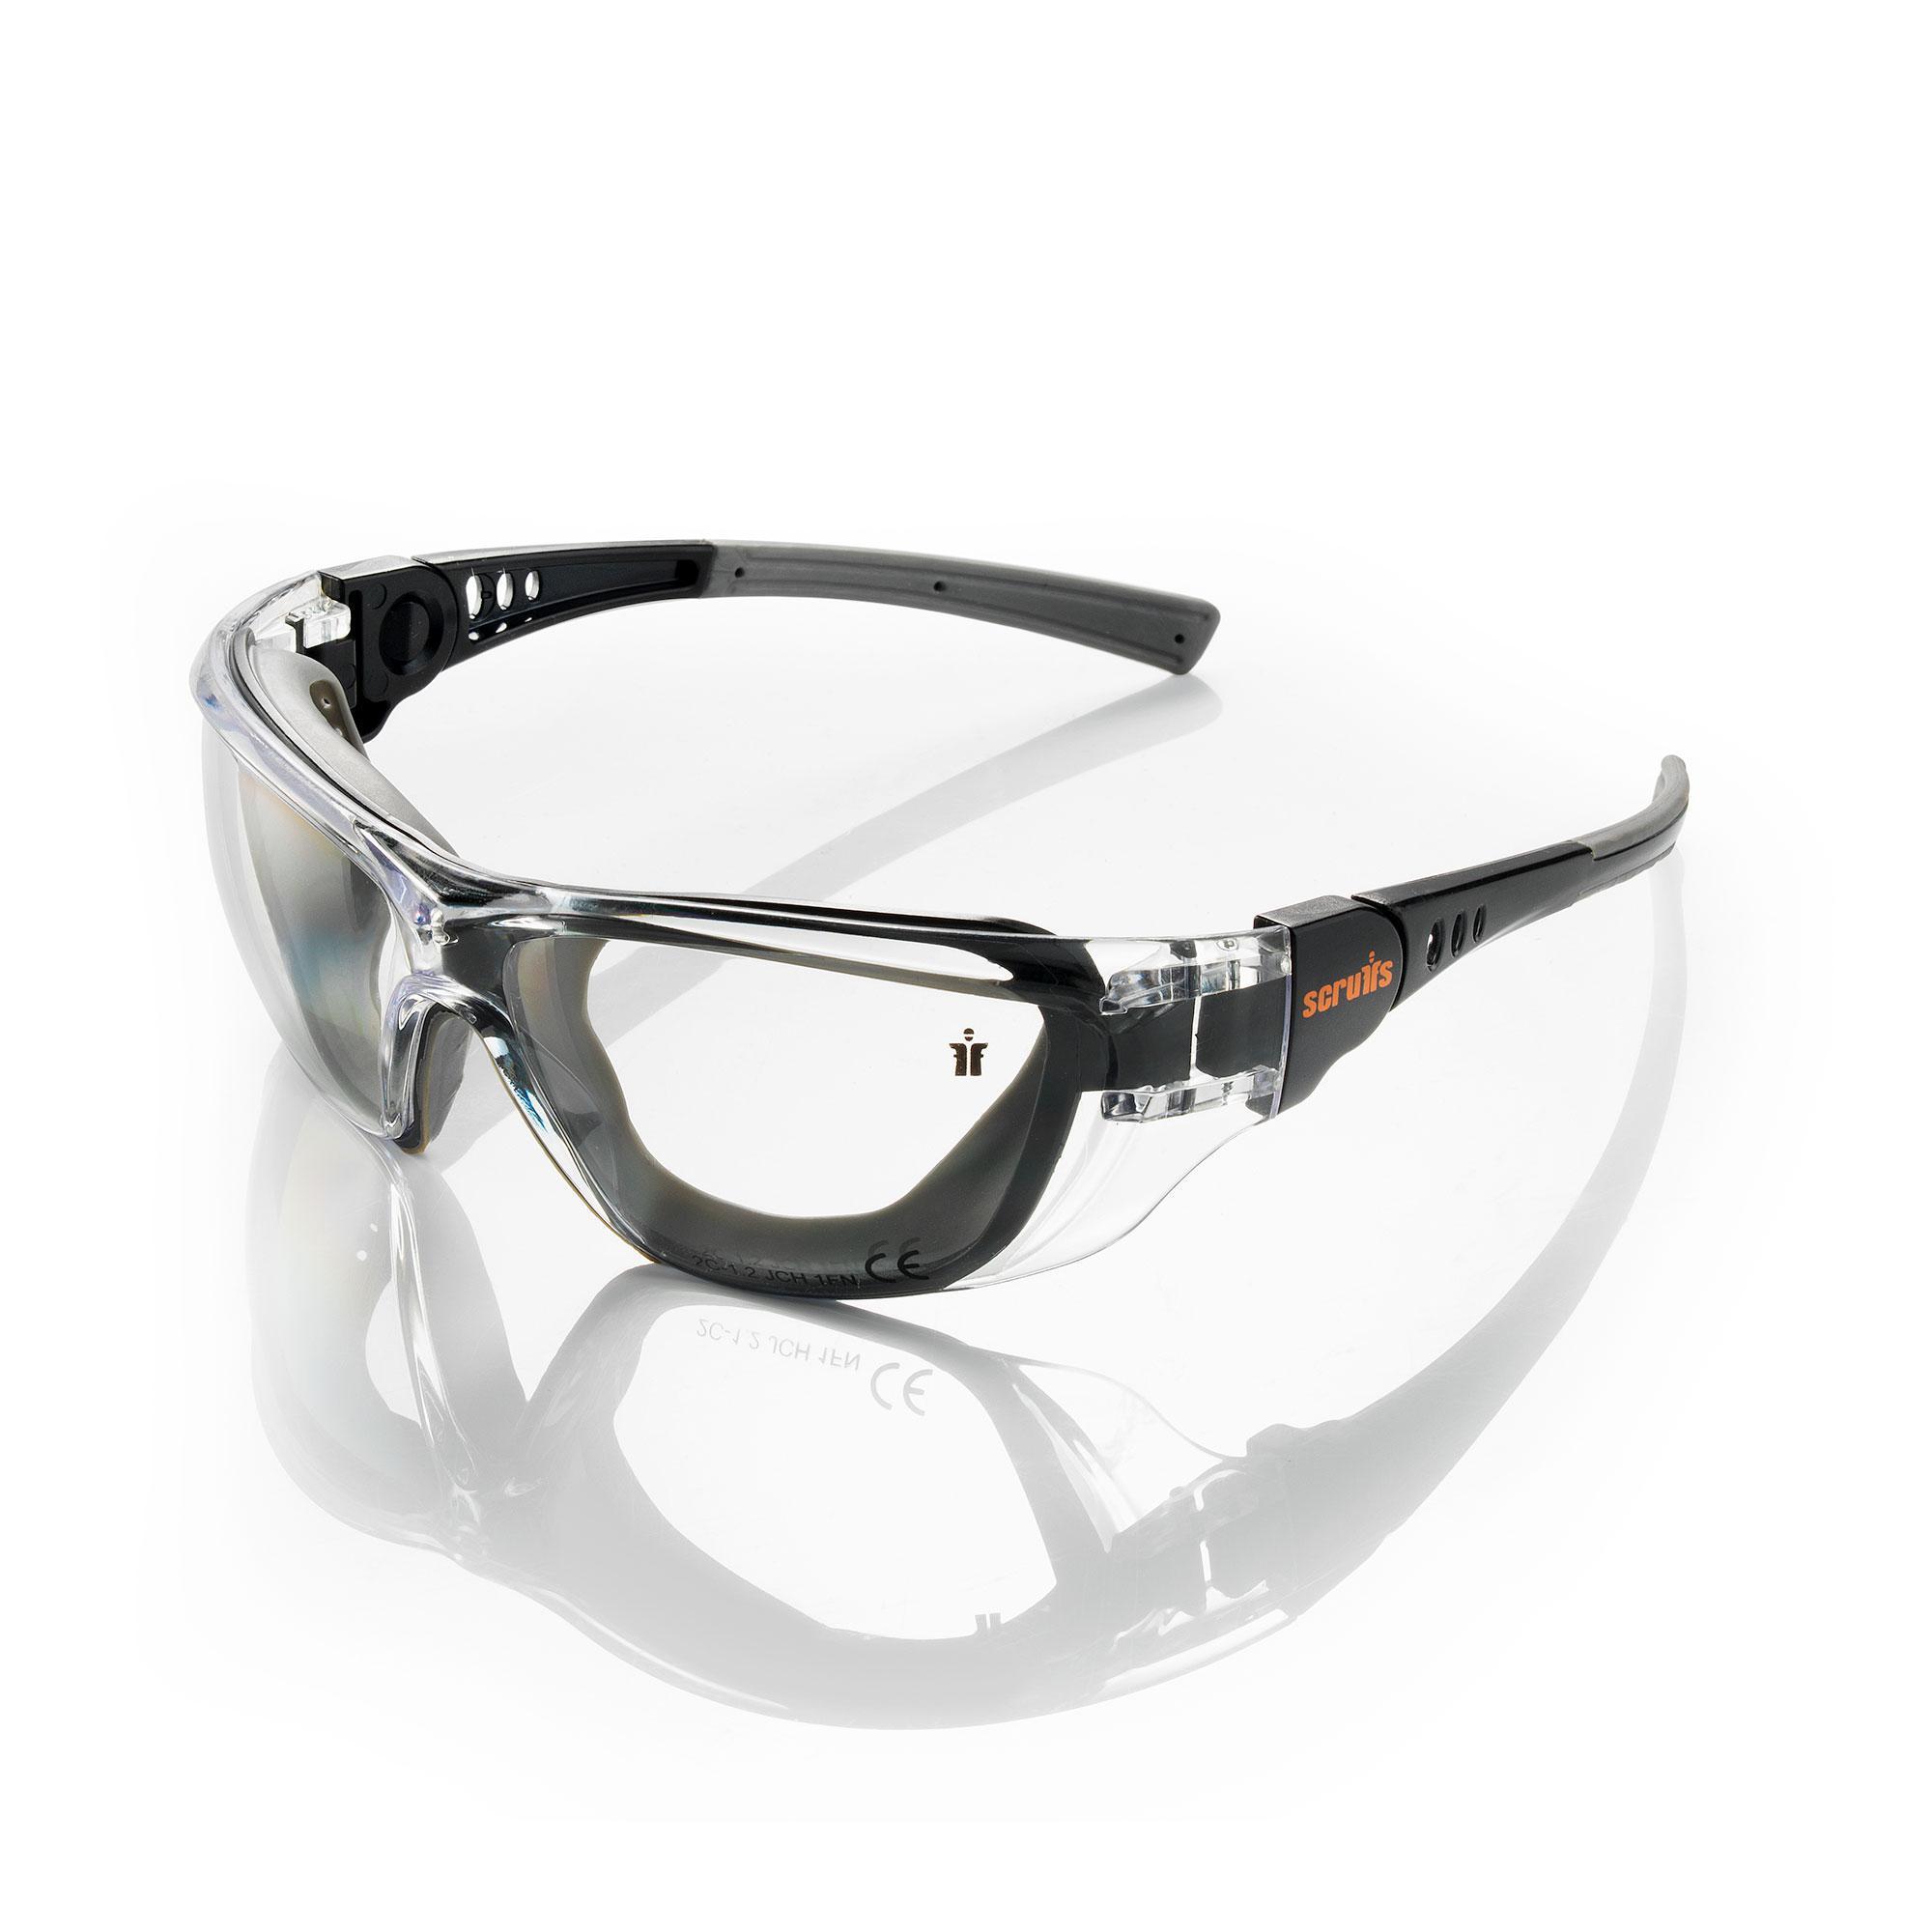 663668cfe0 Safety Glasses